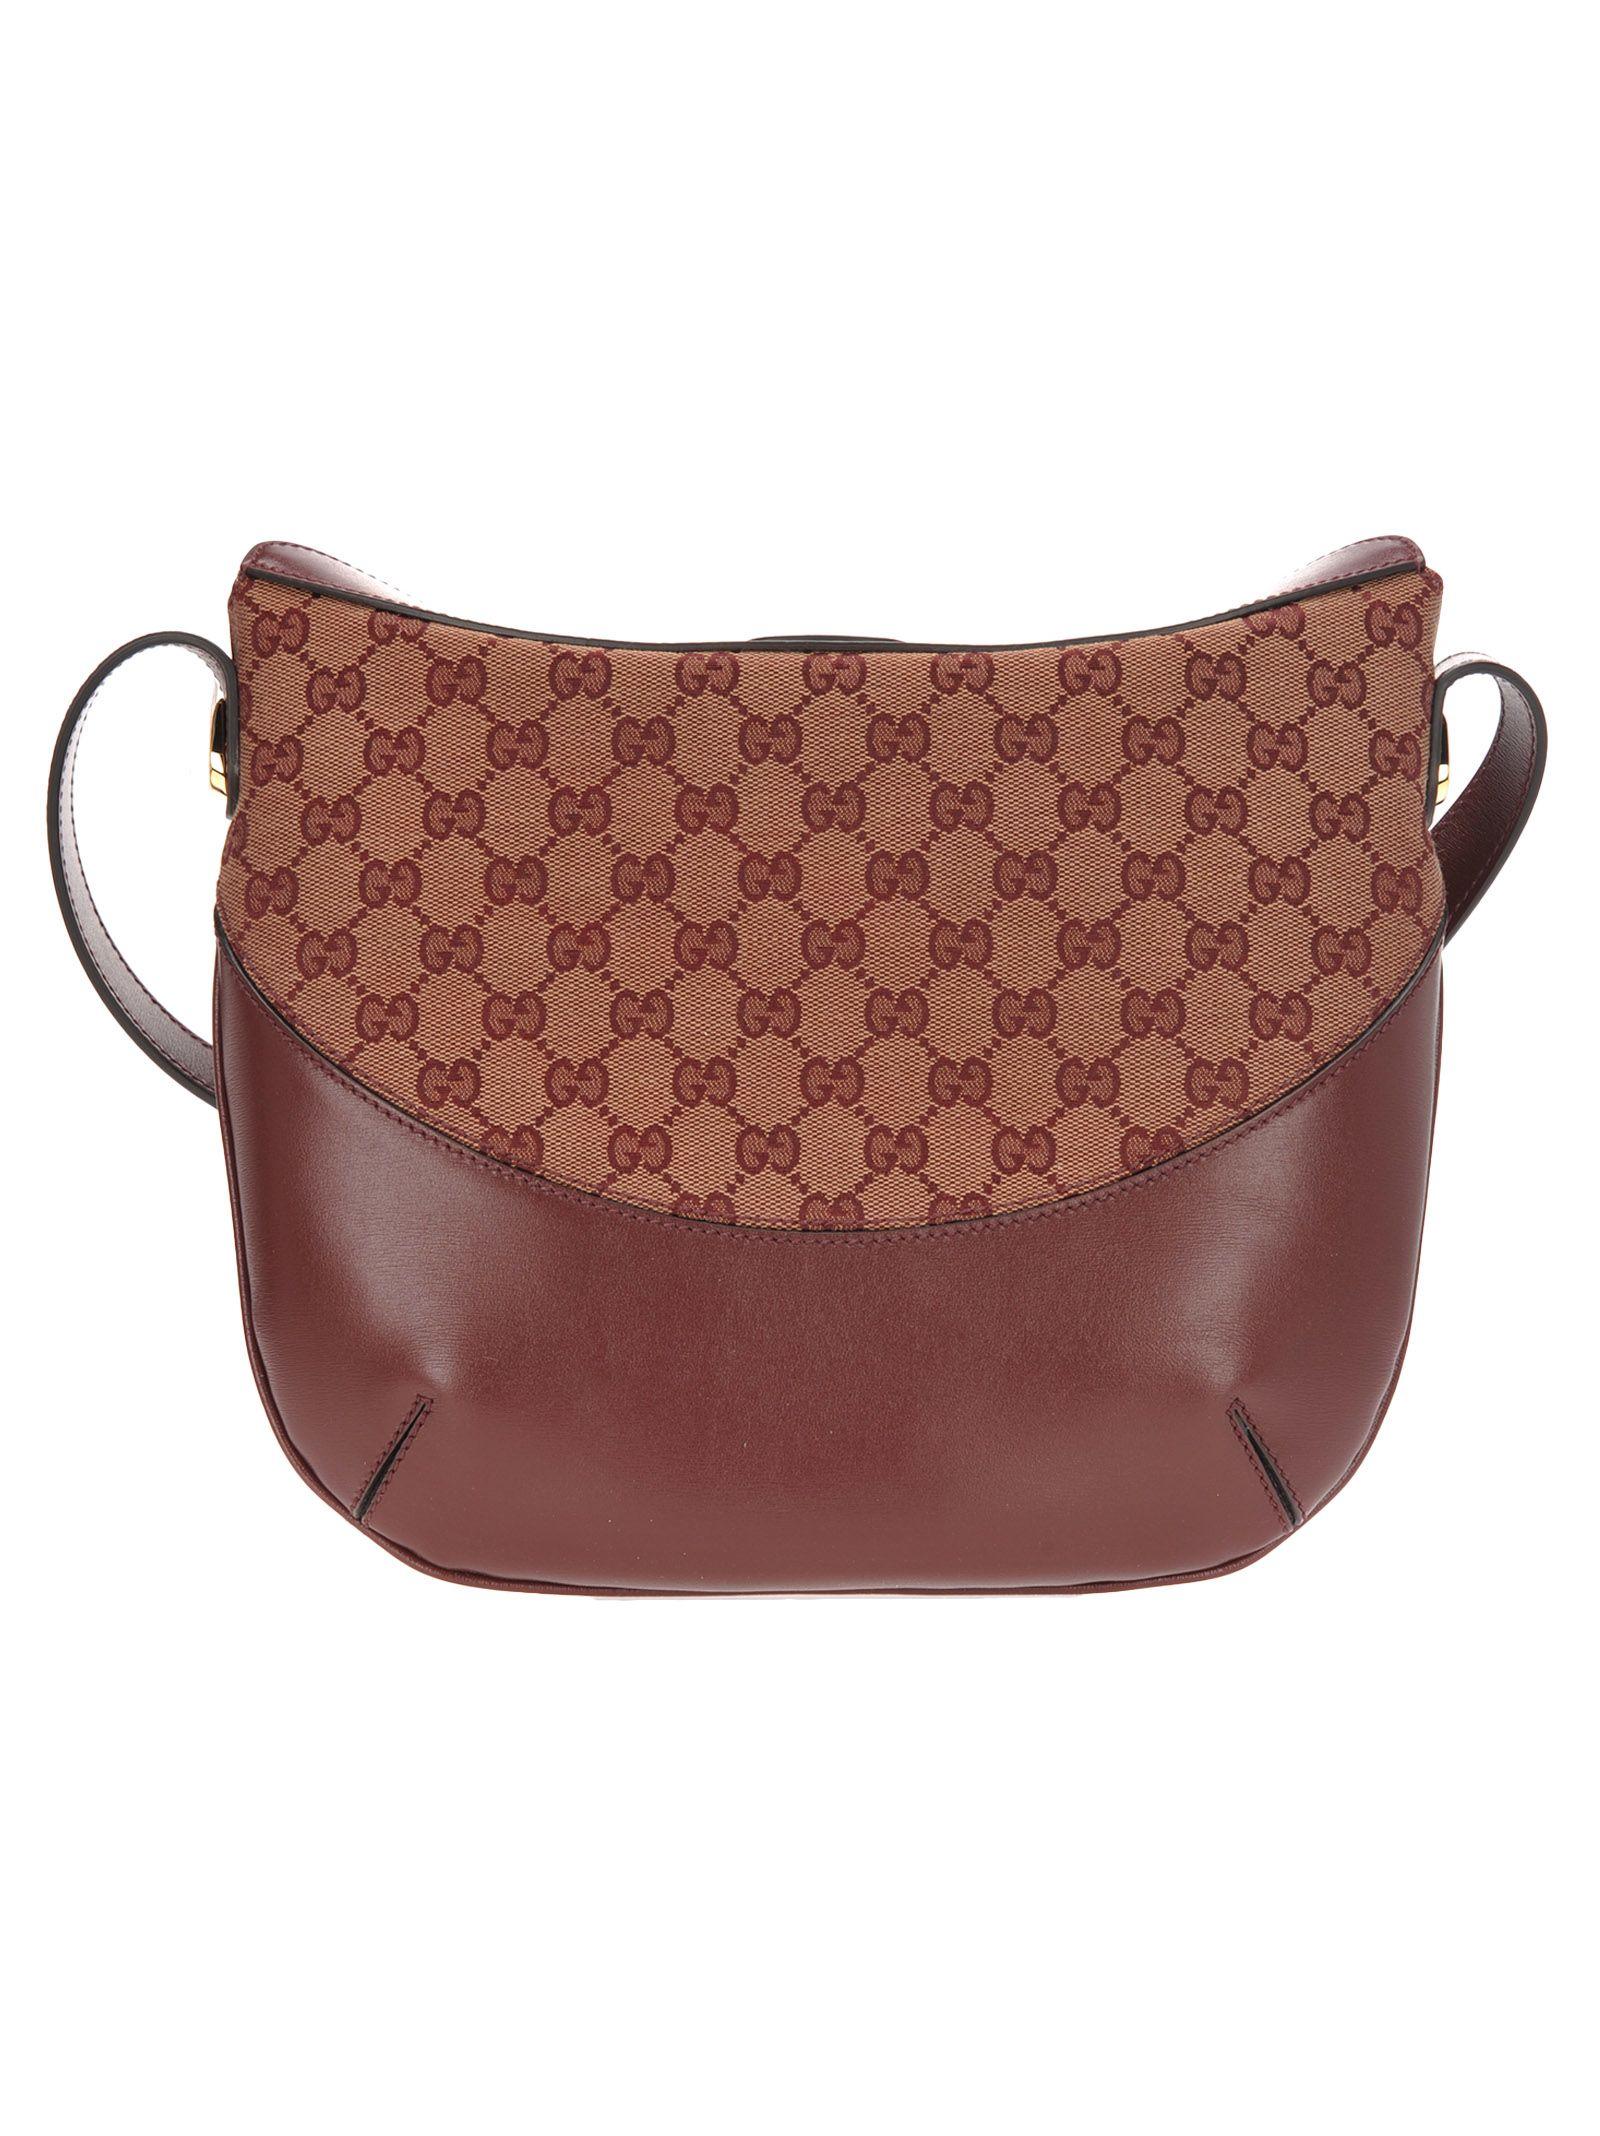 e2edd41caae9f0 Gucci Gucci Gucci Arli Gg Medium Shoulder Bag - BEIGE/BORDEAUX ...